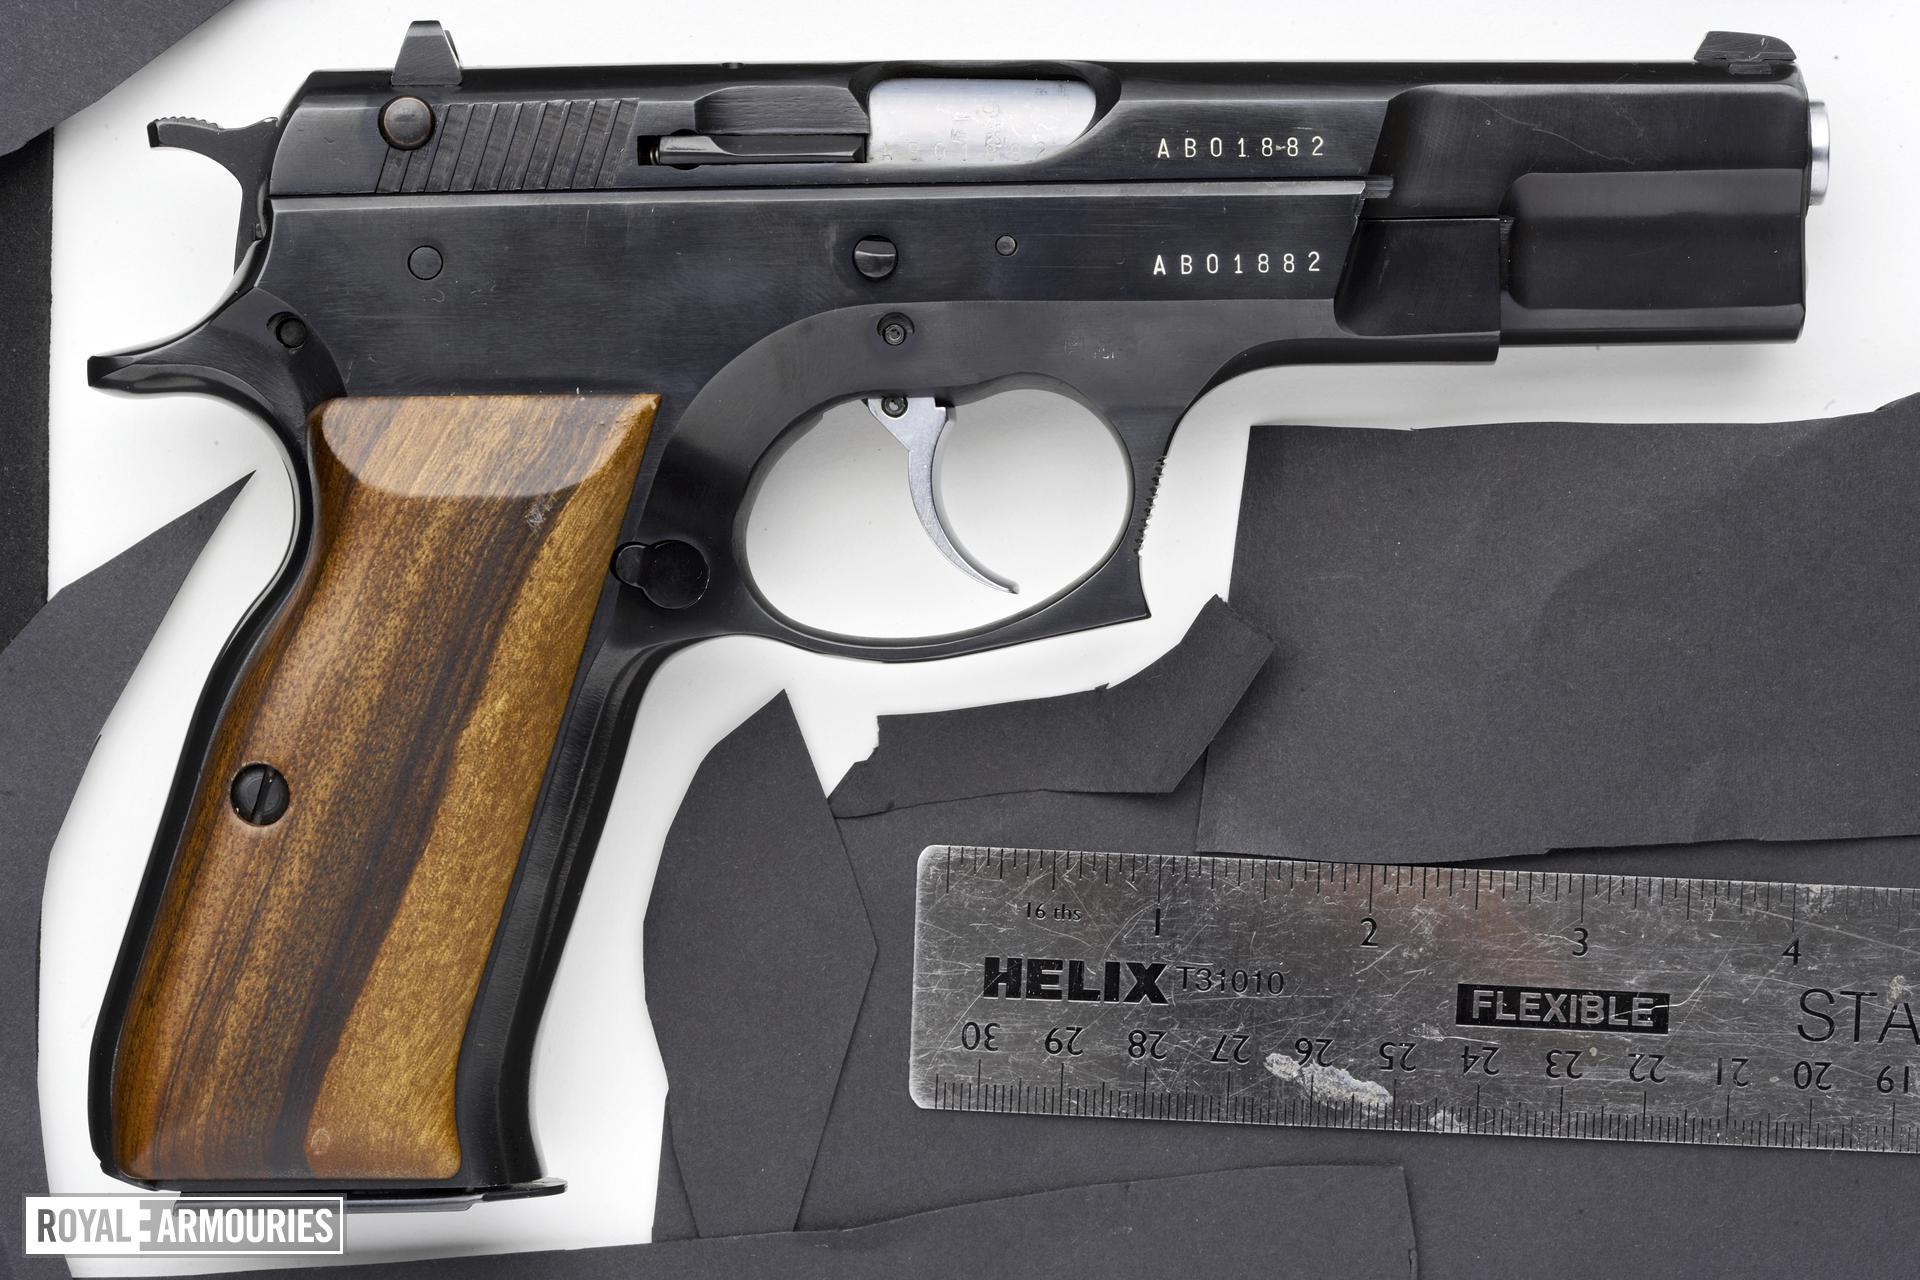 Centrefire self-loading pistol - Tanfoglio TA90